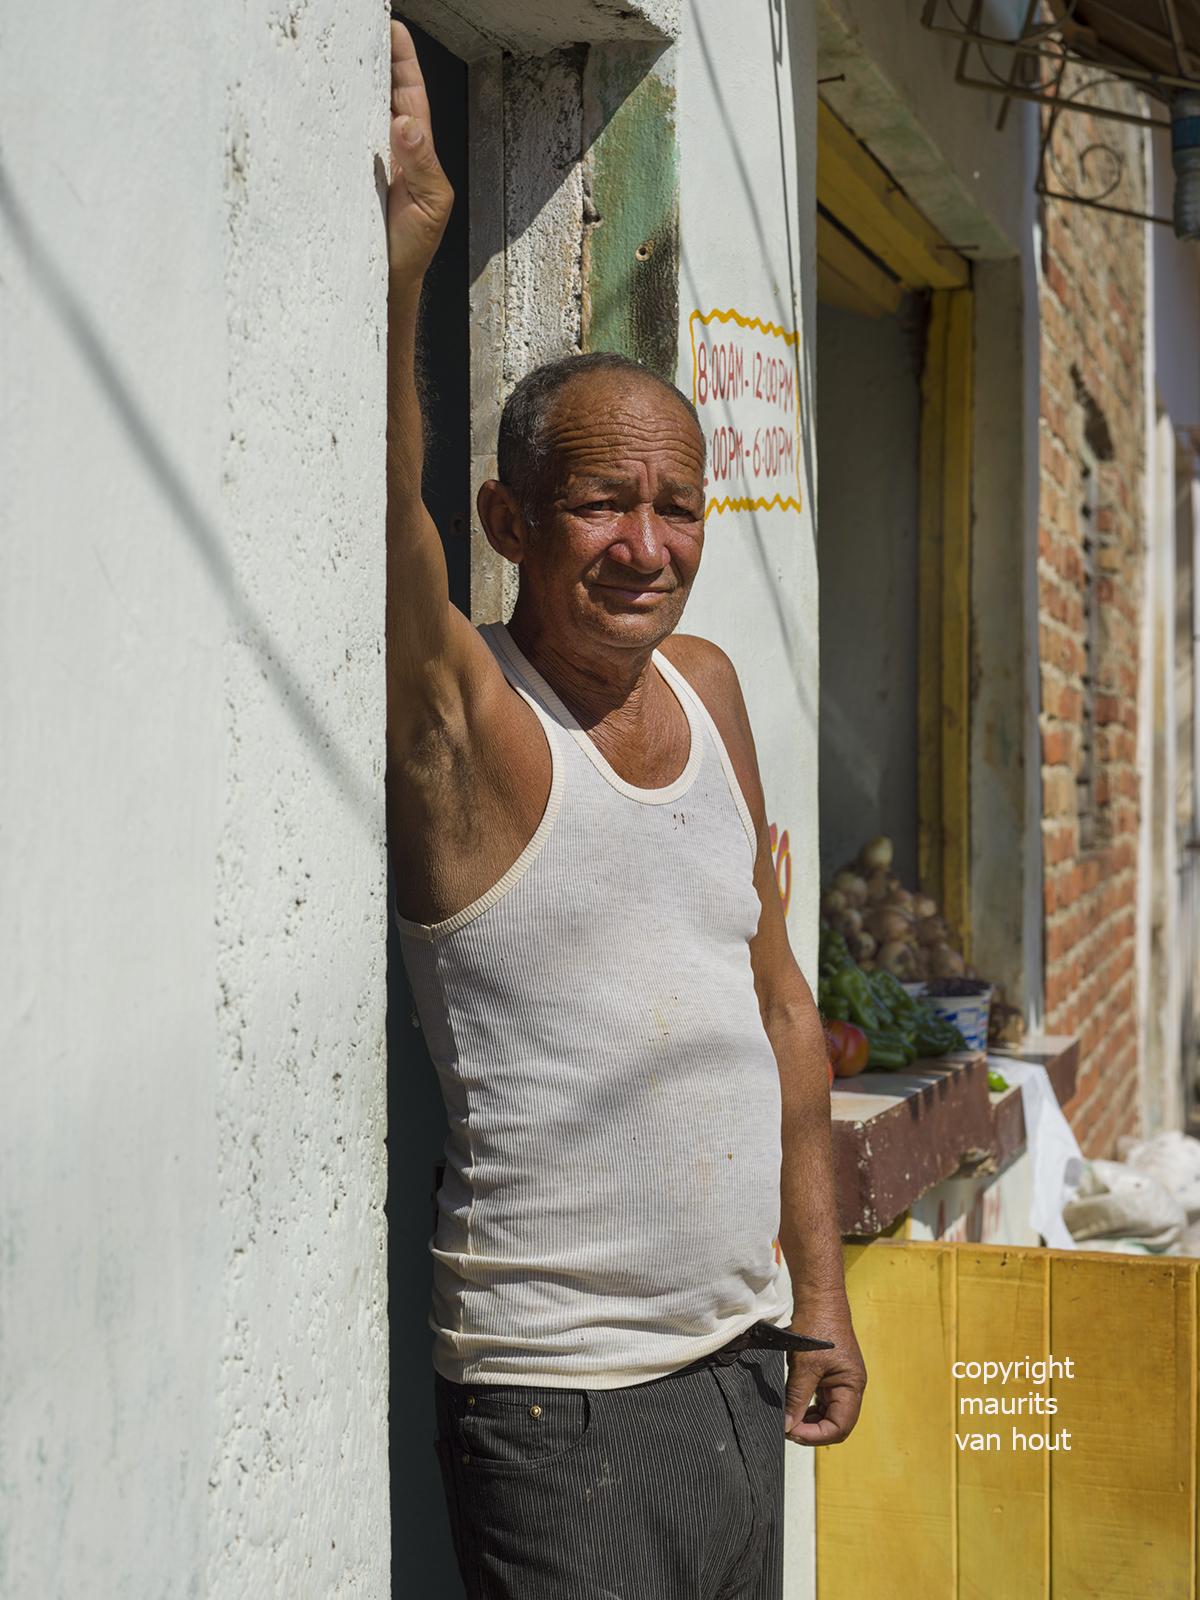 portrait of a man, Trinidad Cuba, by Dutch photographer Maurits van Hout